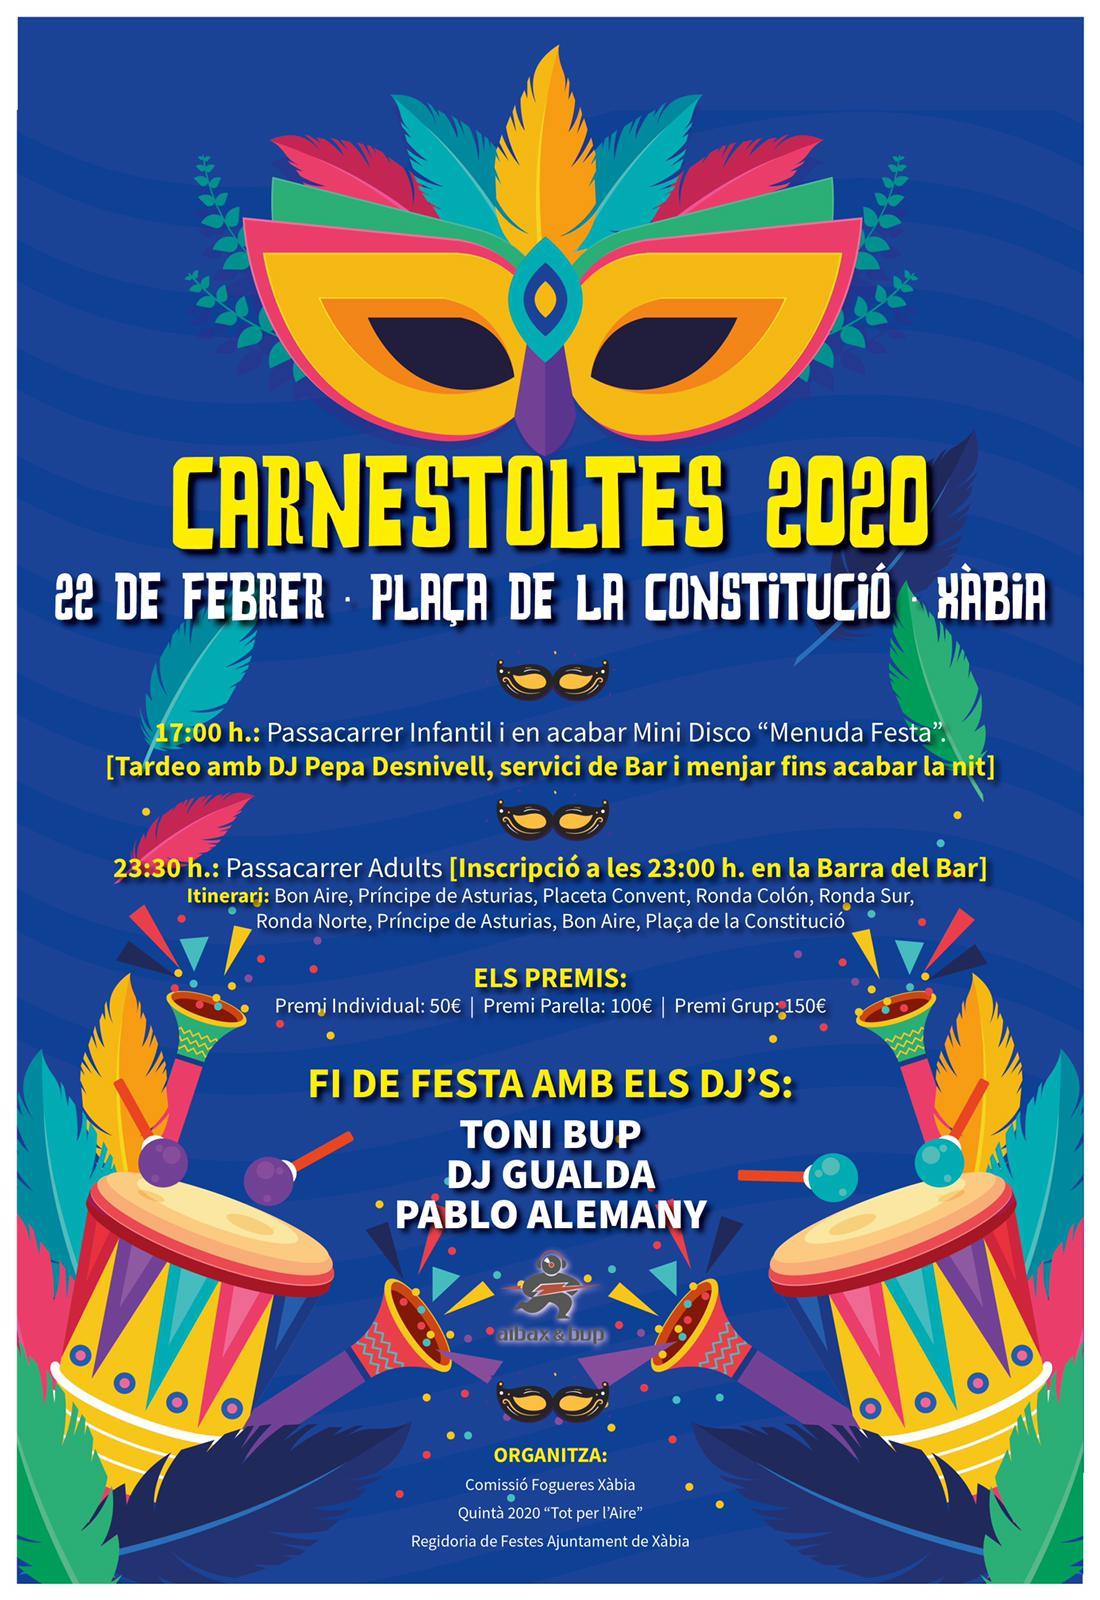 Carnestoltes Xàbia 2020